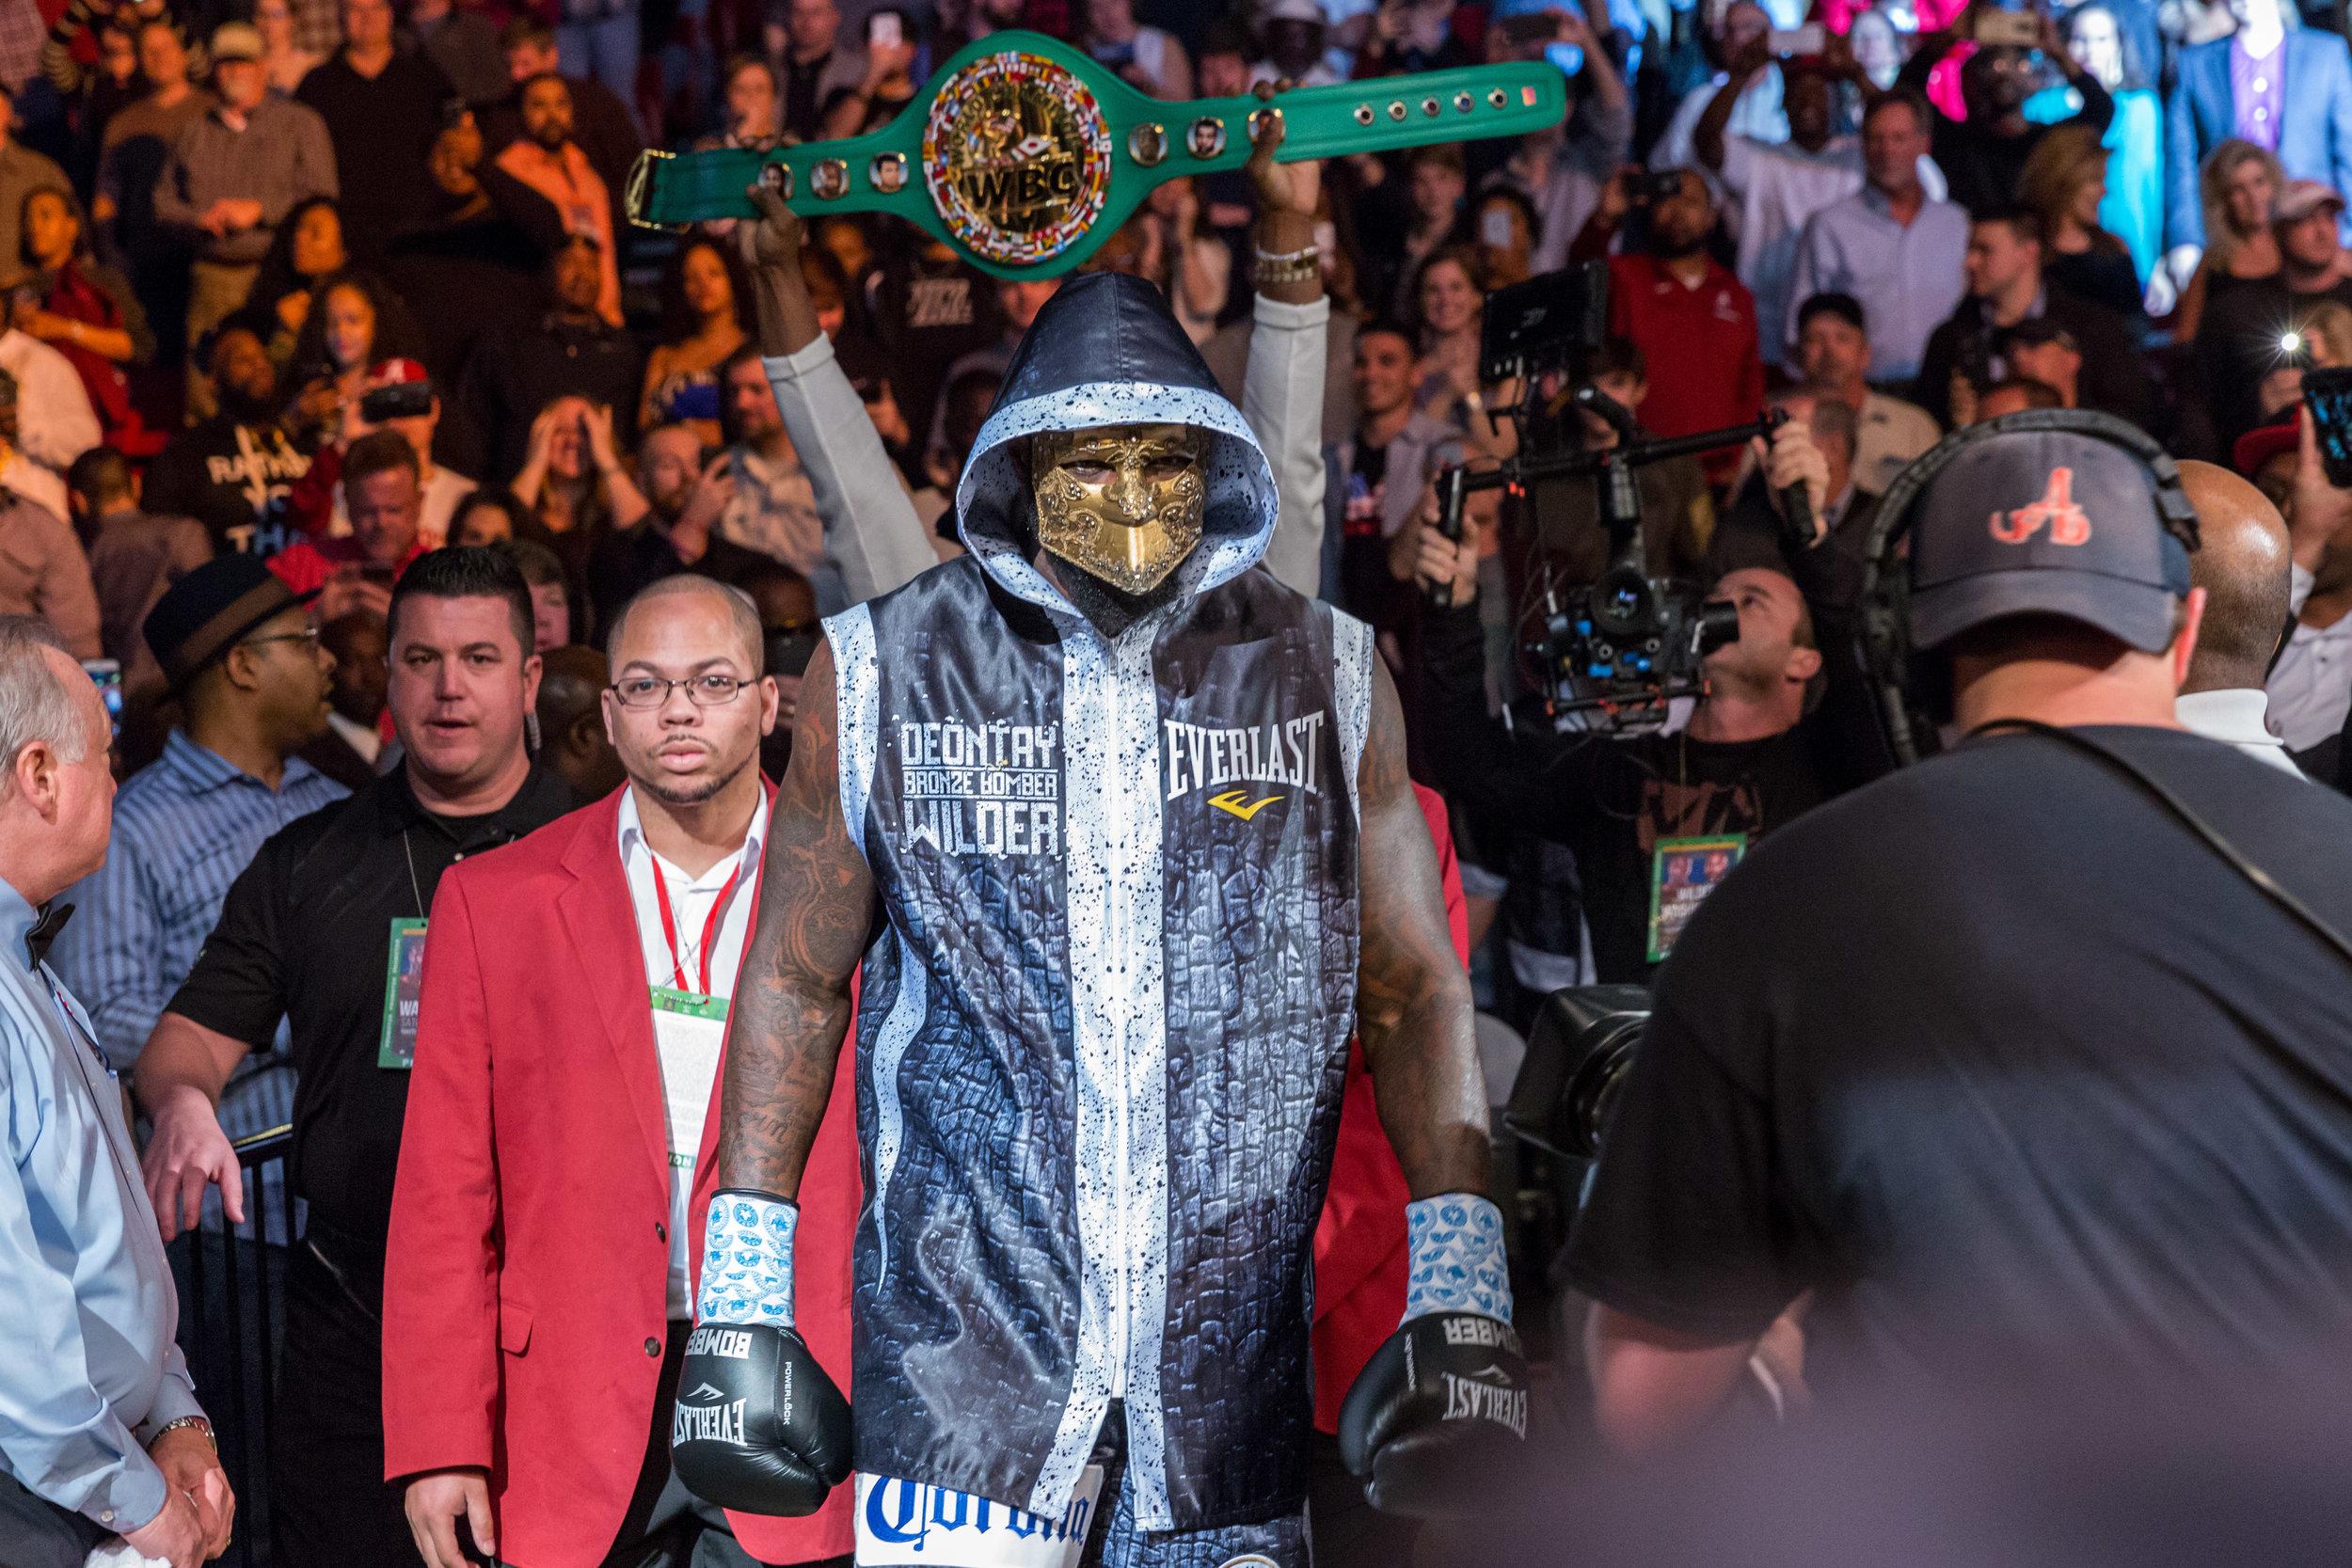 Deontay Wilder vs Gerald Washington - February 25_ 2017_02_25_2017_Fight_Ryan Hafey _ Premier Boxing Champions.jpg